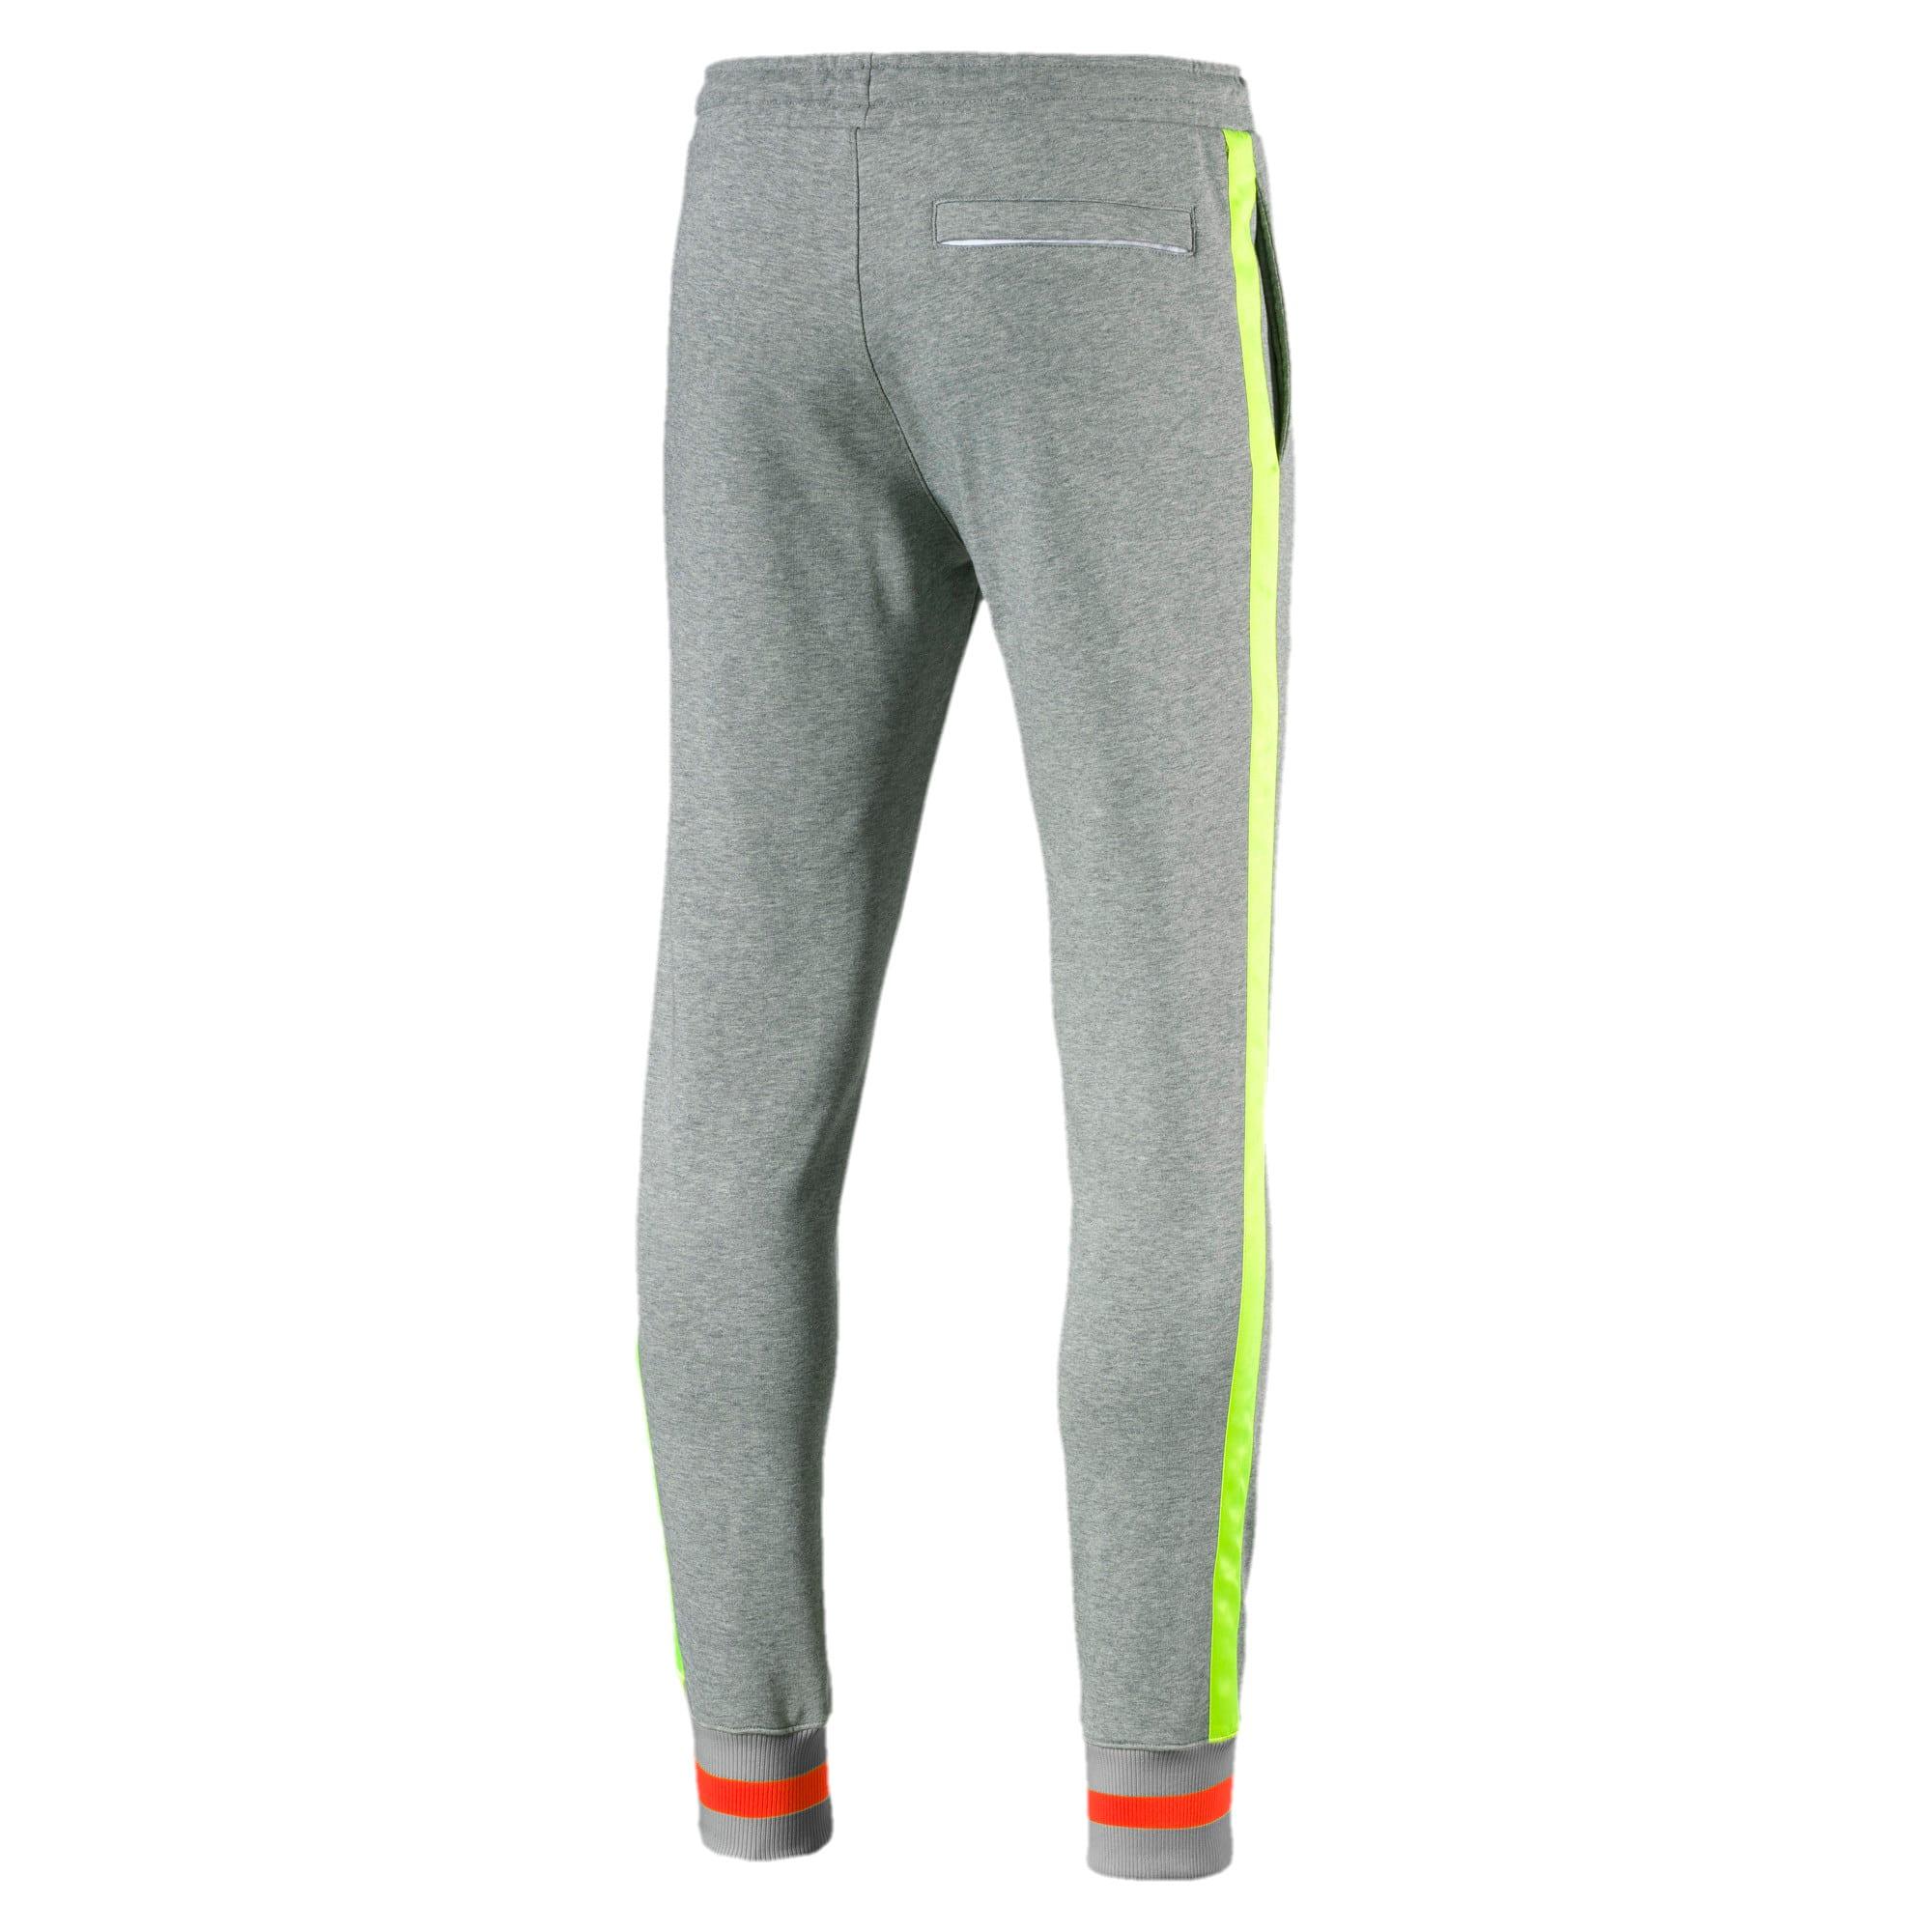 Thumbnail 5 of luXTG Men's Cuffed Sweatpants, Medium Gray Heather, medium